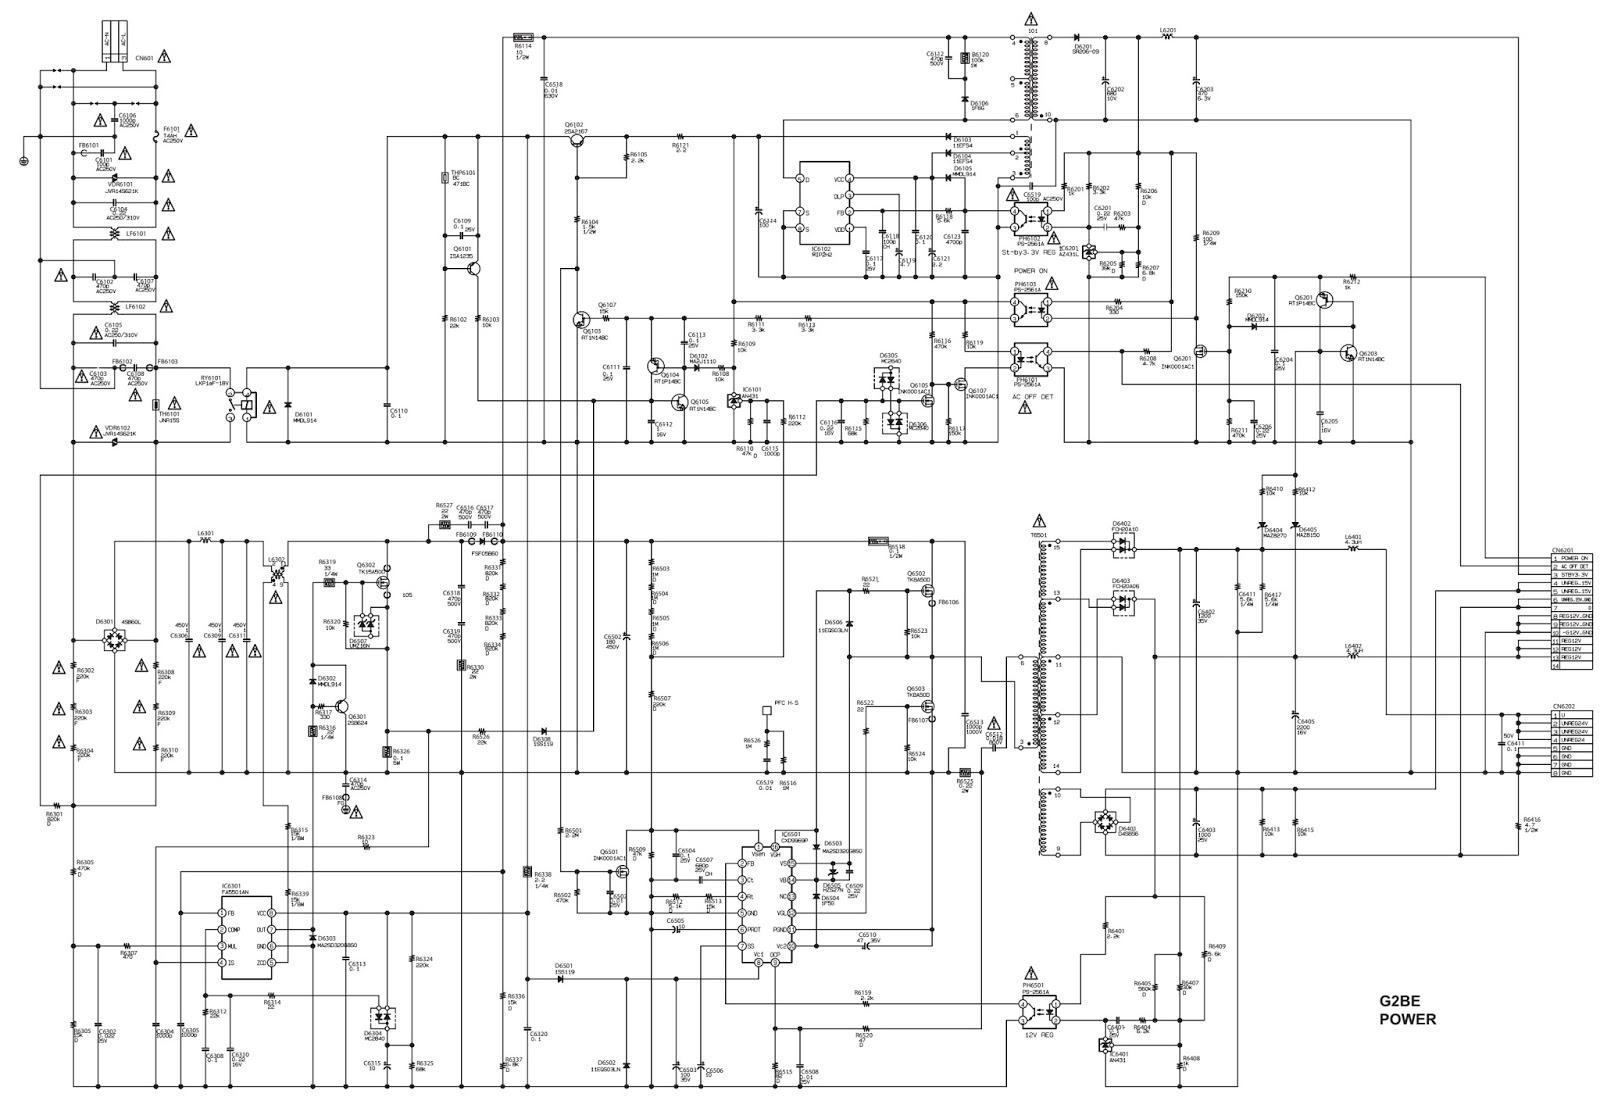 Electronic Inspirations  Sony Klv32v550  U2013 Led Blinking Codes  U2013 Self Diagnosis Function  U2013 Smps